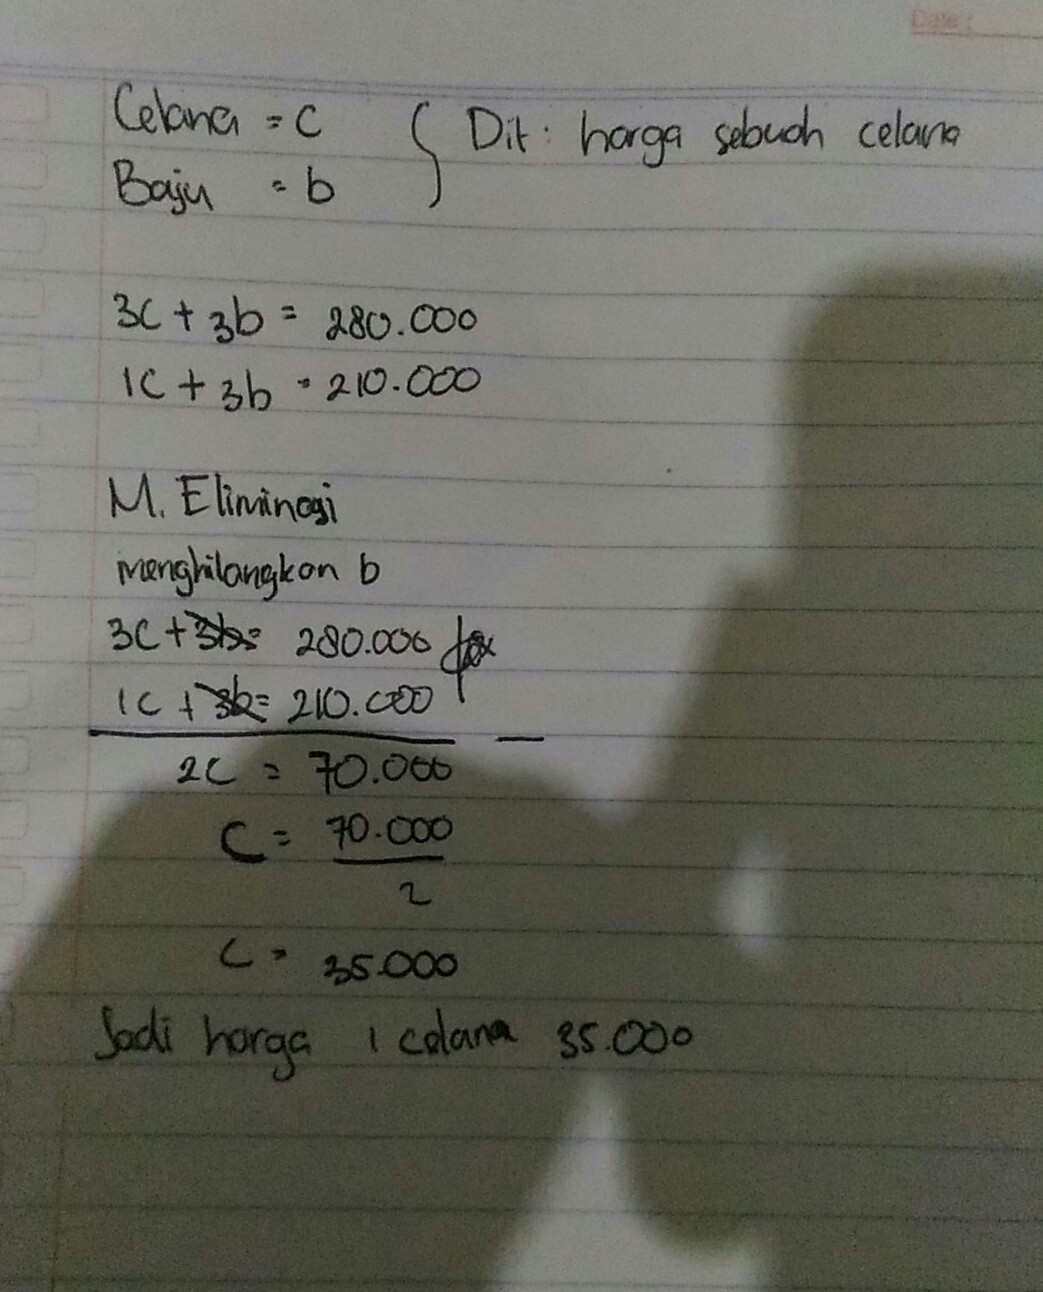 Harga 3 Celana Dan 3 Baju Adalah Rp28000000Sedangkan Harga 1